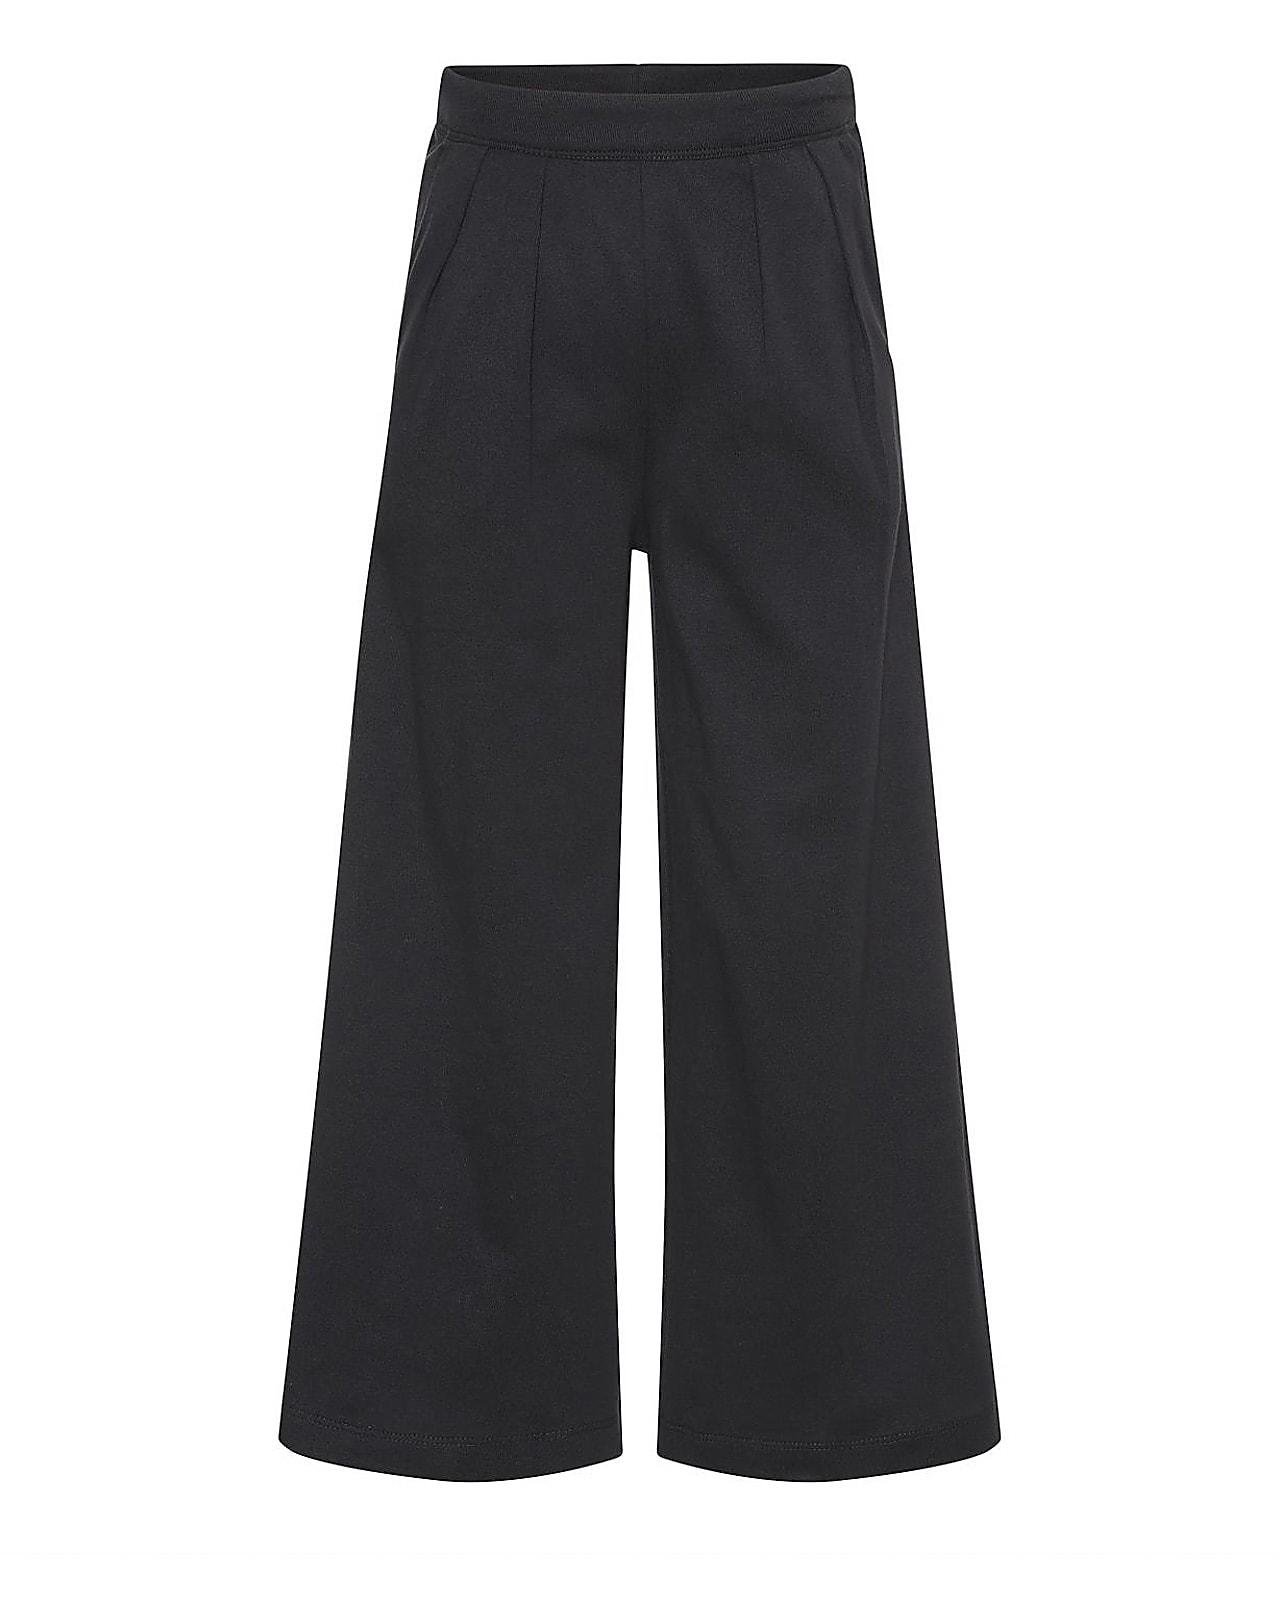 Image of Molo wide pant, Ana, black